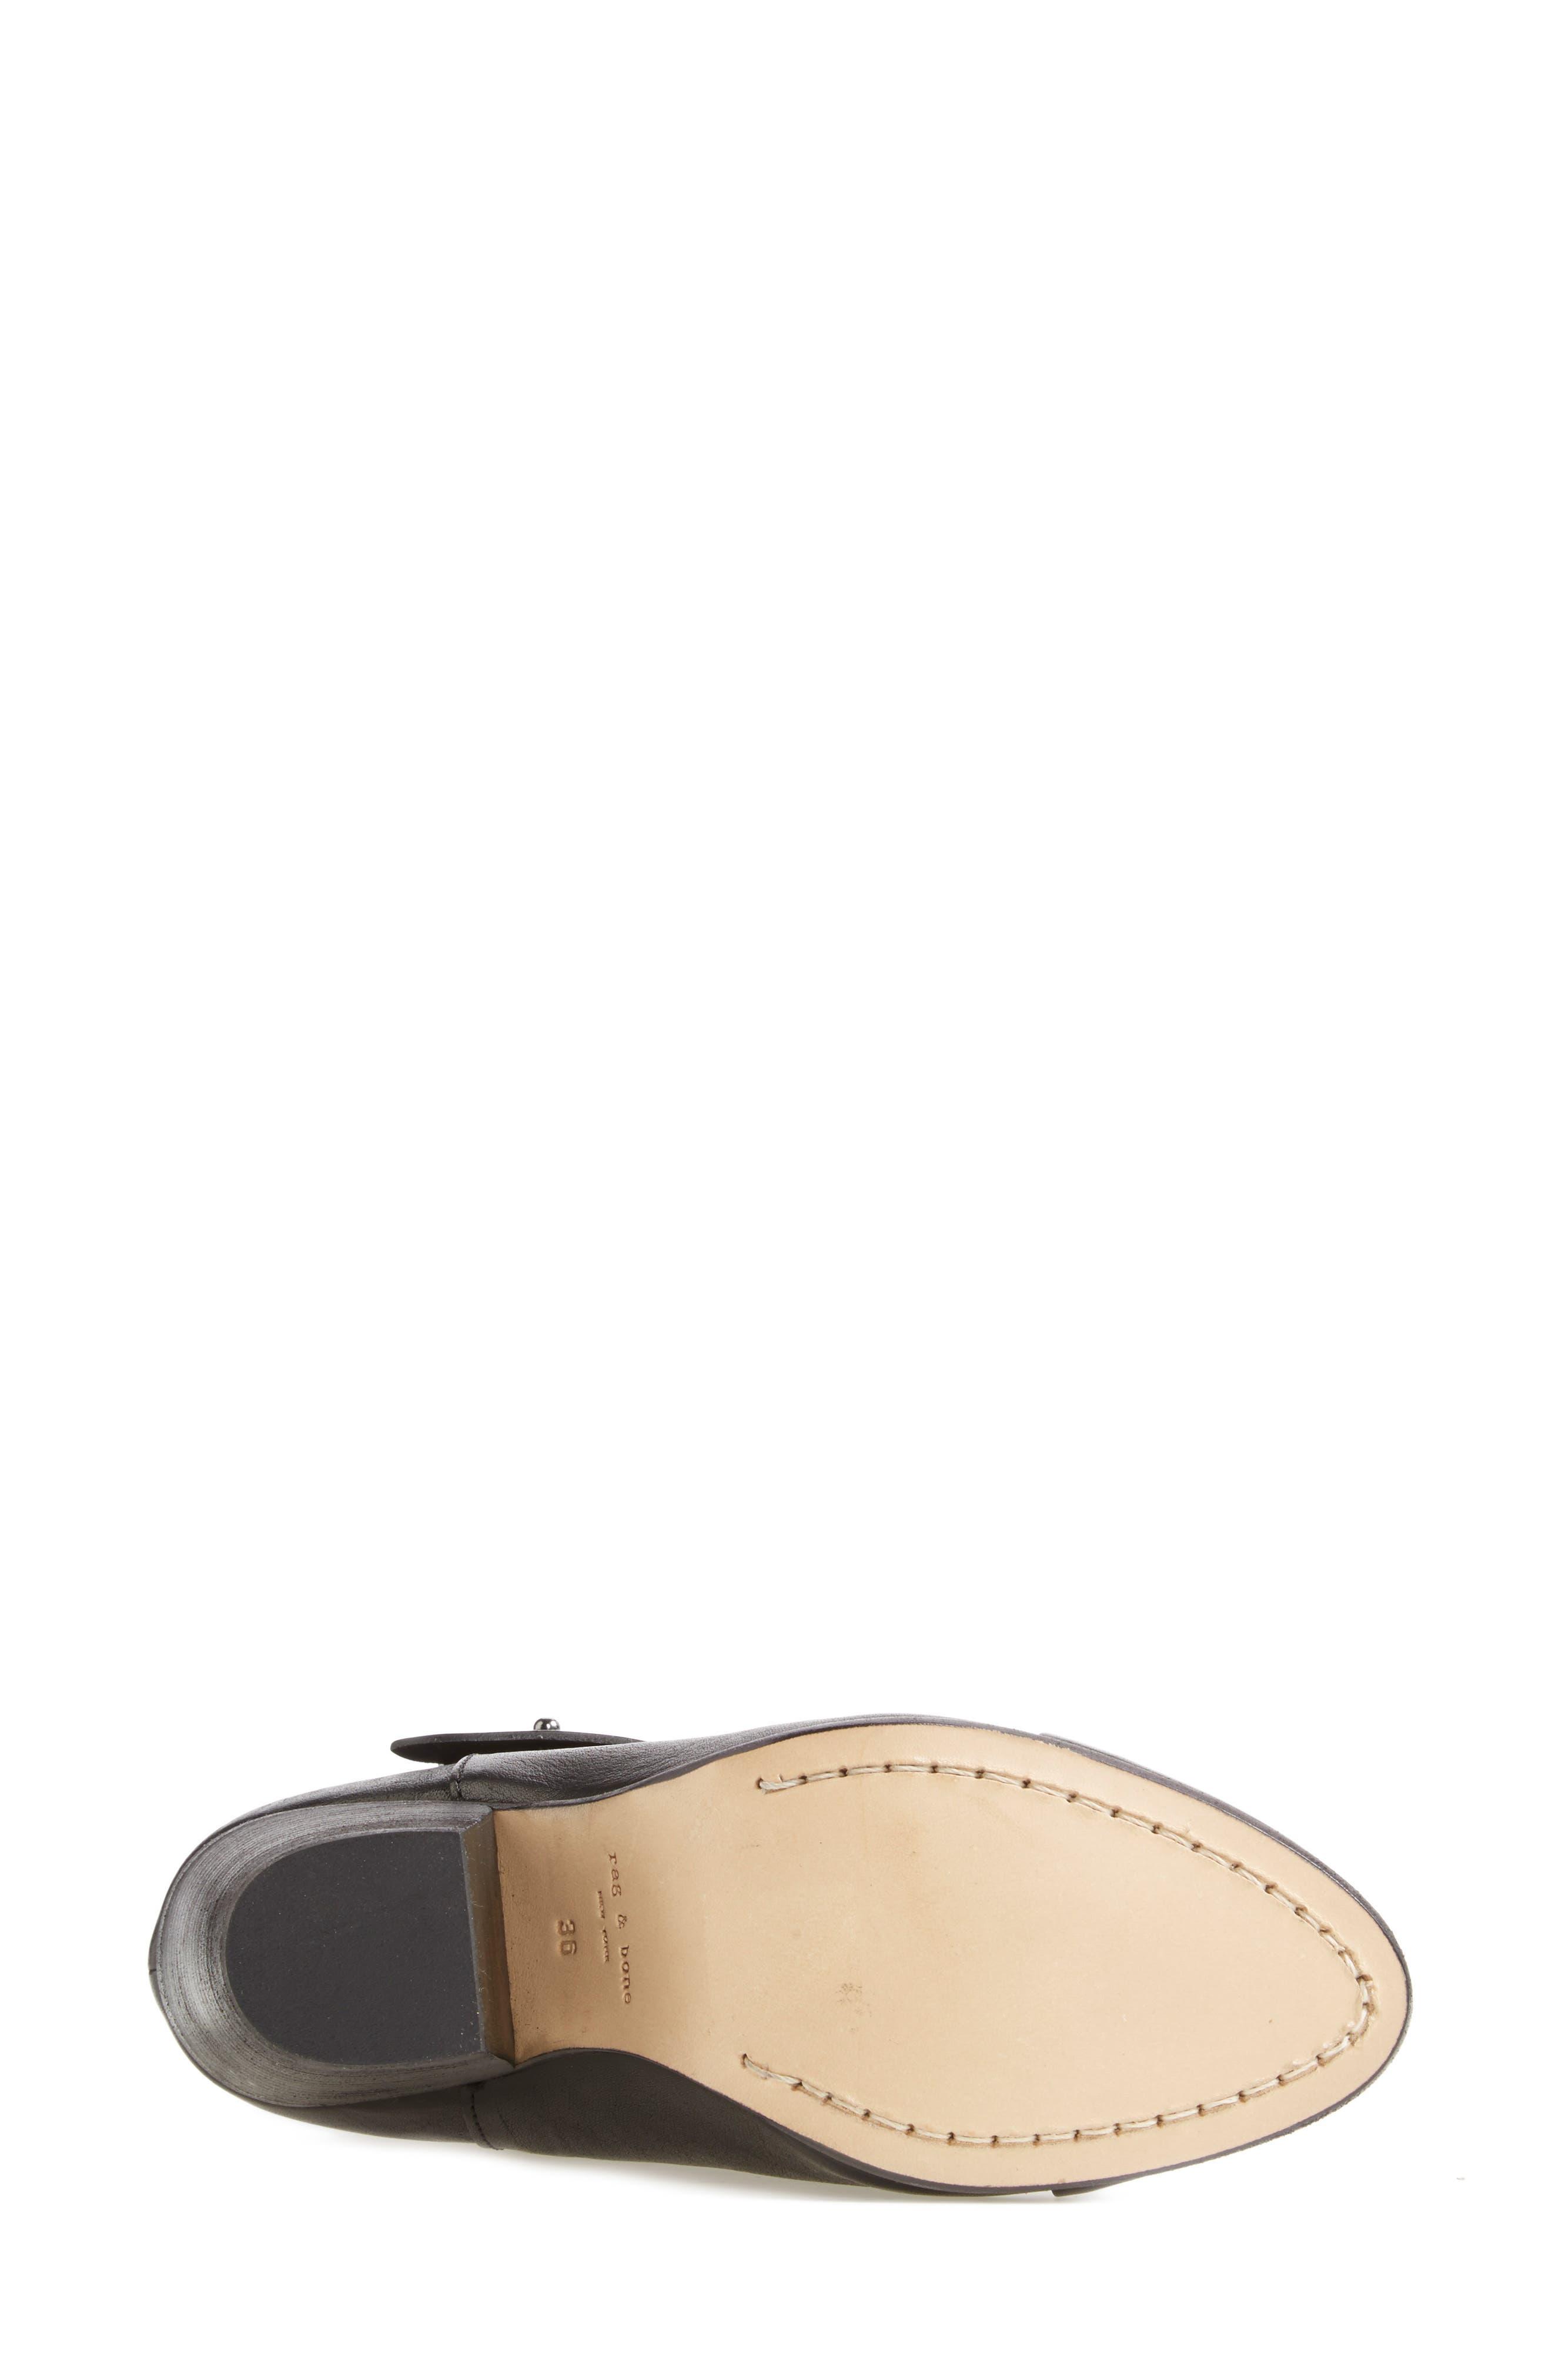 'Harrow' Leather Boot,                             Alternate thumbnail 4, color,                             BLACK